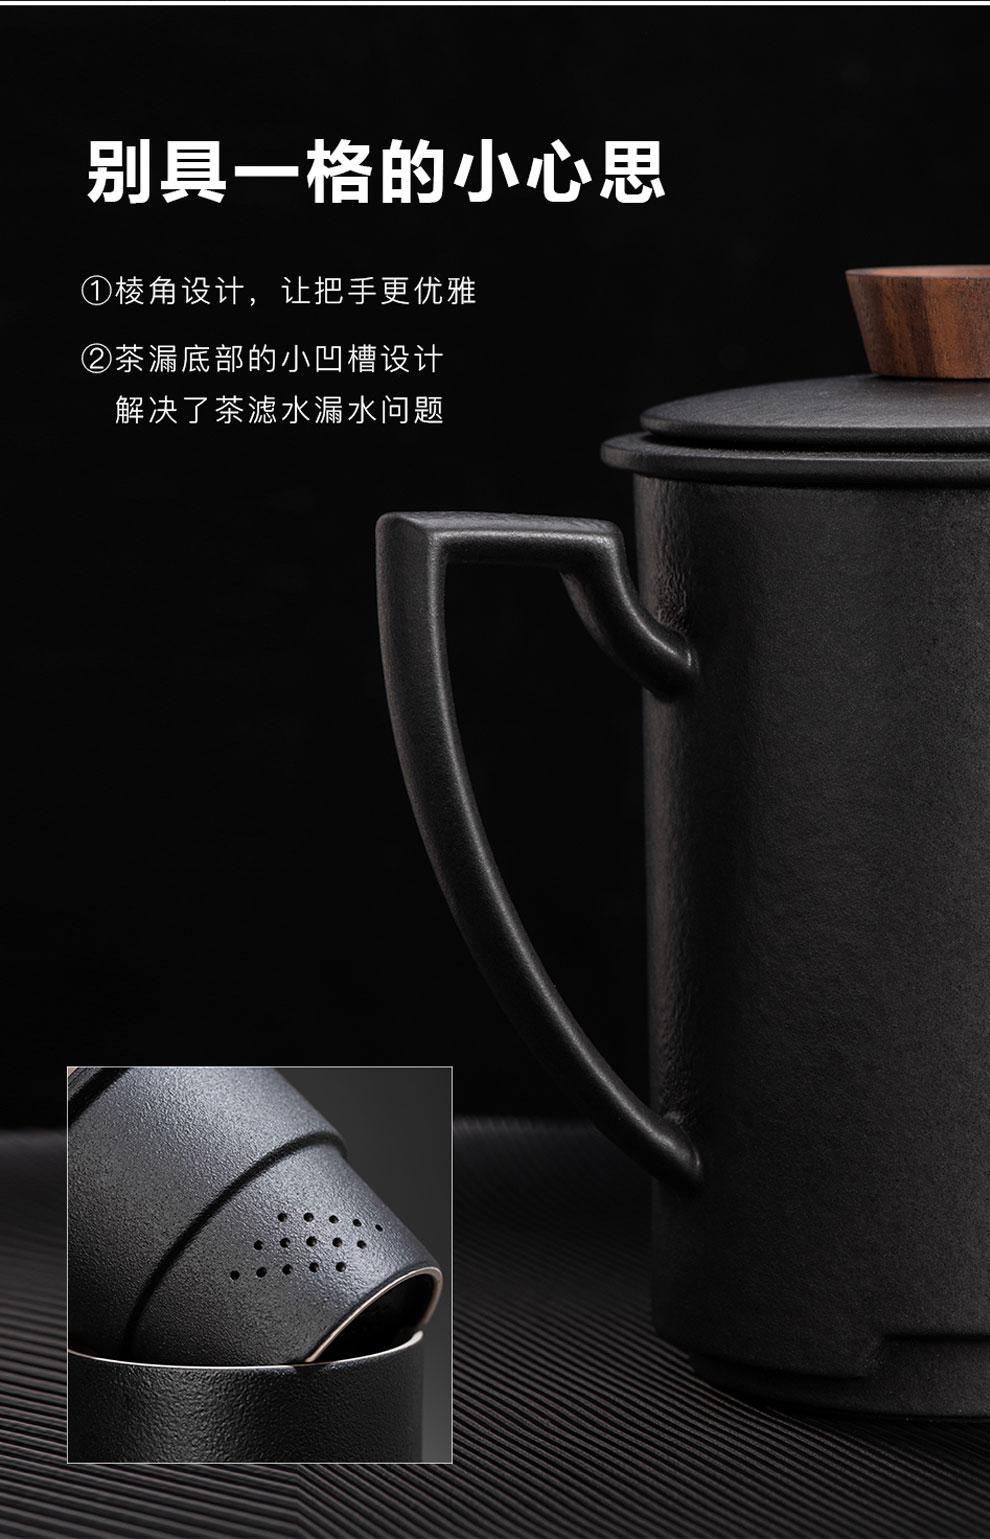 Jingdezhen ceramic tea set) grind arenaceous enamel high - end business office with household gift box set